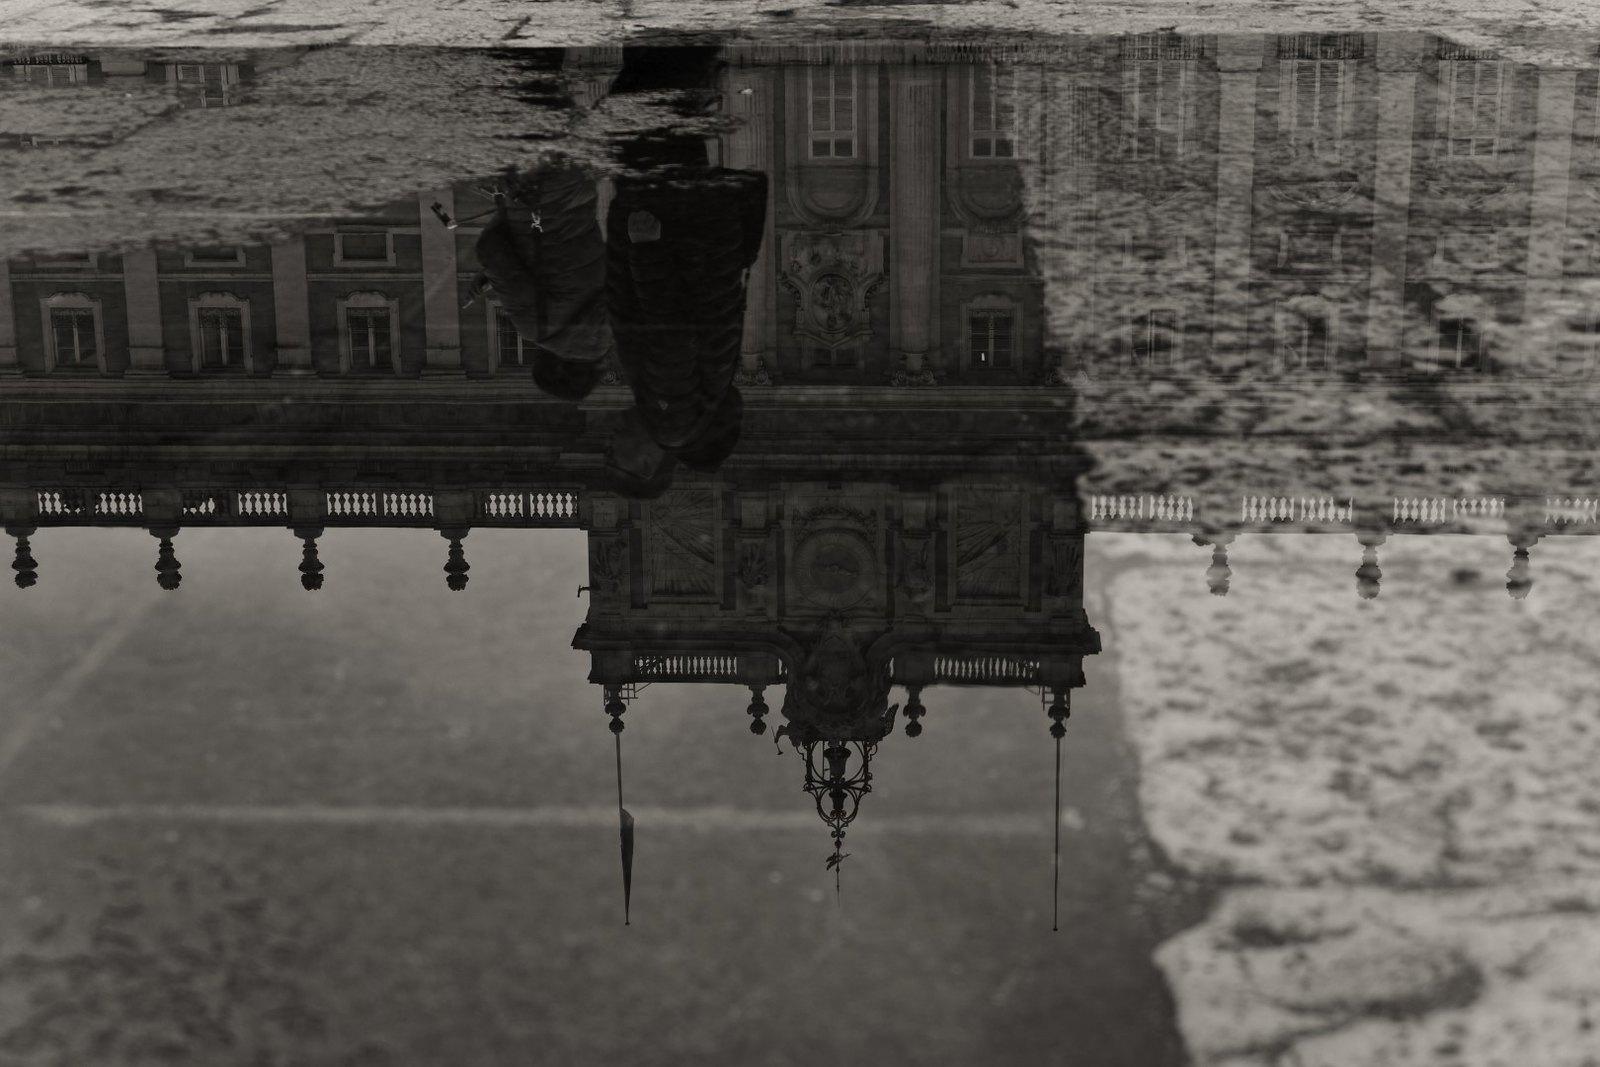 Palacio Real de Madrid, Fujifilm X-T10, XC16-50mmF3.5-5.6 OIS II